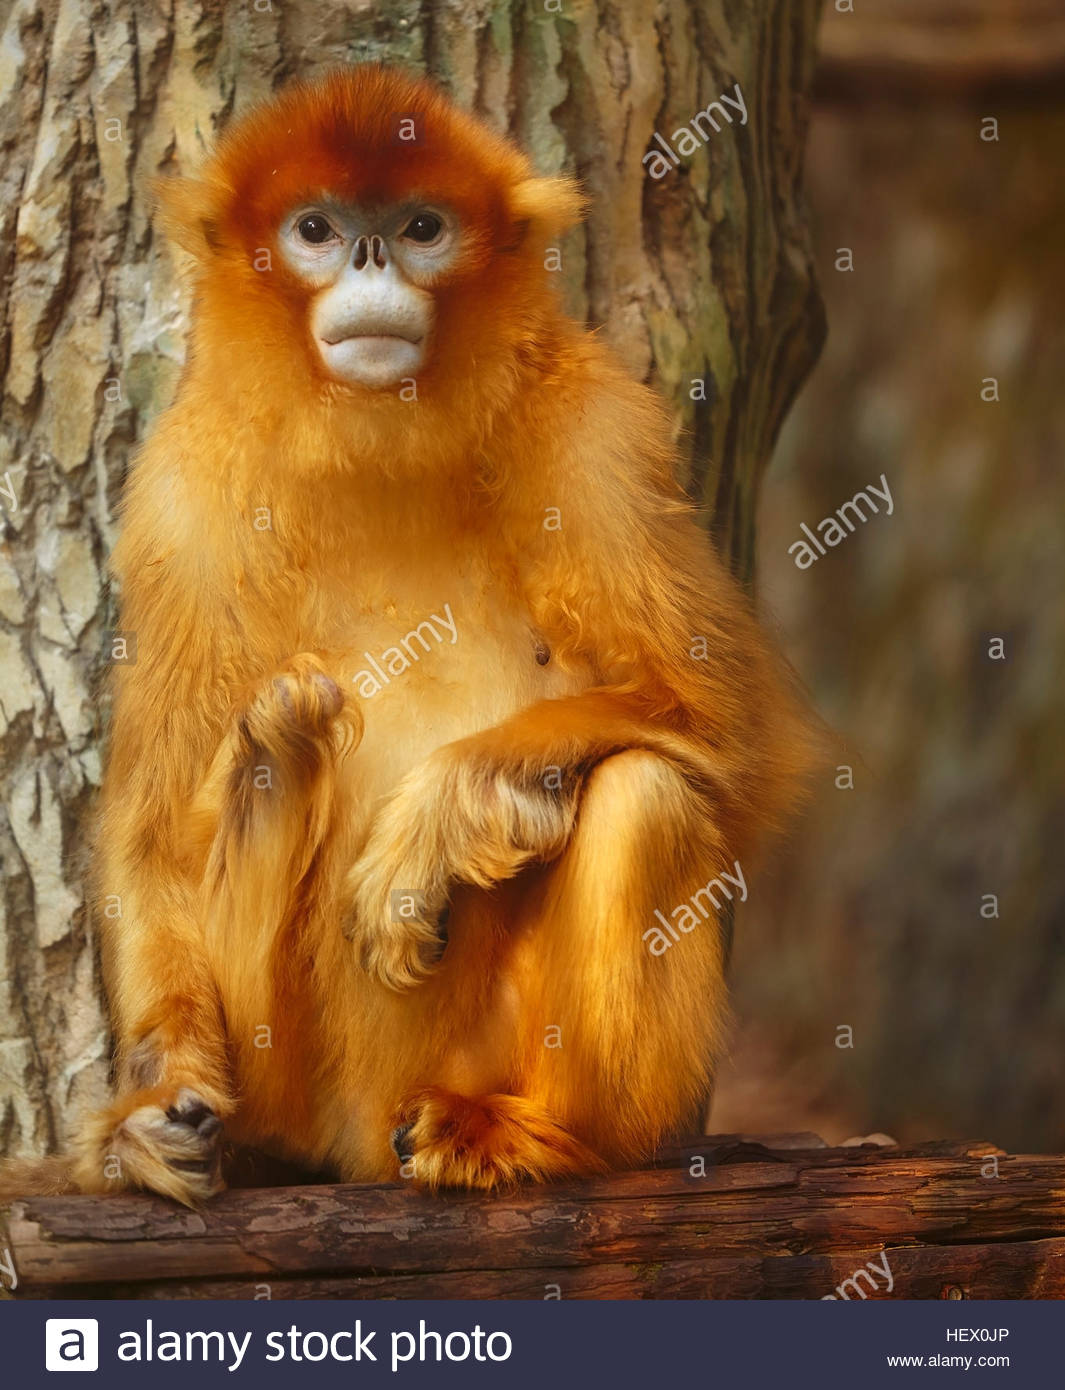 A Golden Snub-nosed monkey, Rhinopithecus roxellana, in Nanjing Zoo, Nanjing, Jiangsu province, China. A highly - Stock Image